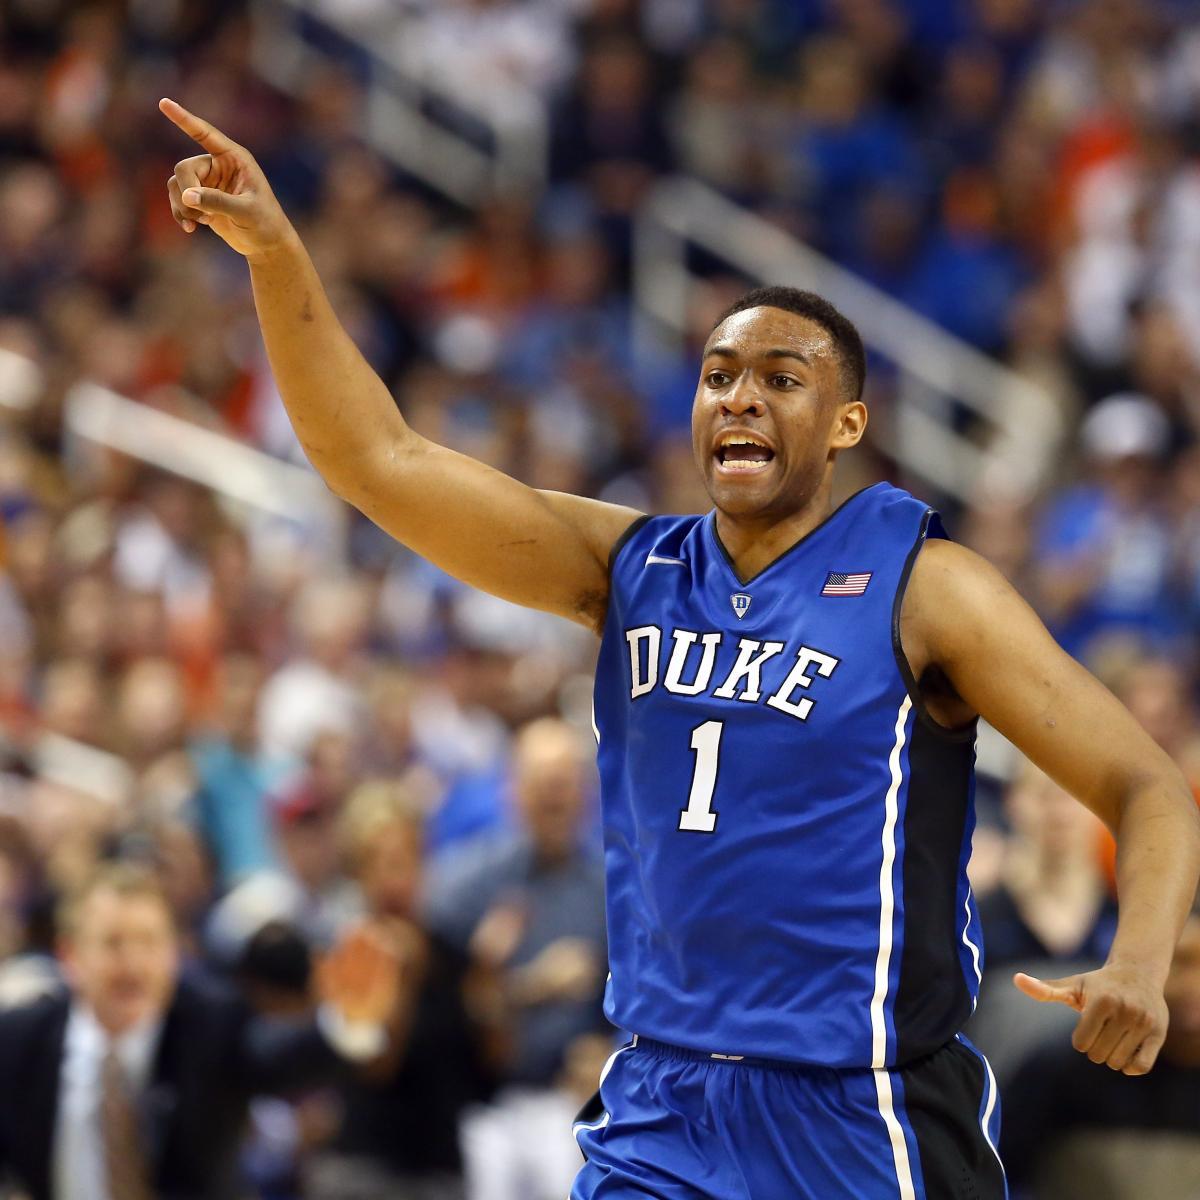 Jabari Parker NBA Draft 2014: Highlights, Scouting Report ... Jabari Parker Nba Draft